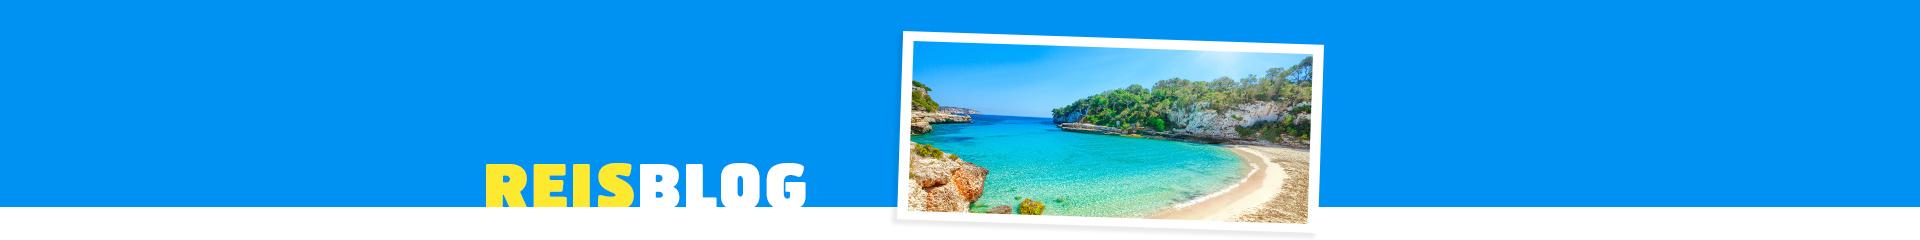 Highlights van Spanje: 9x de mooiste stranden